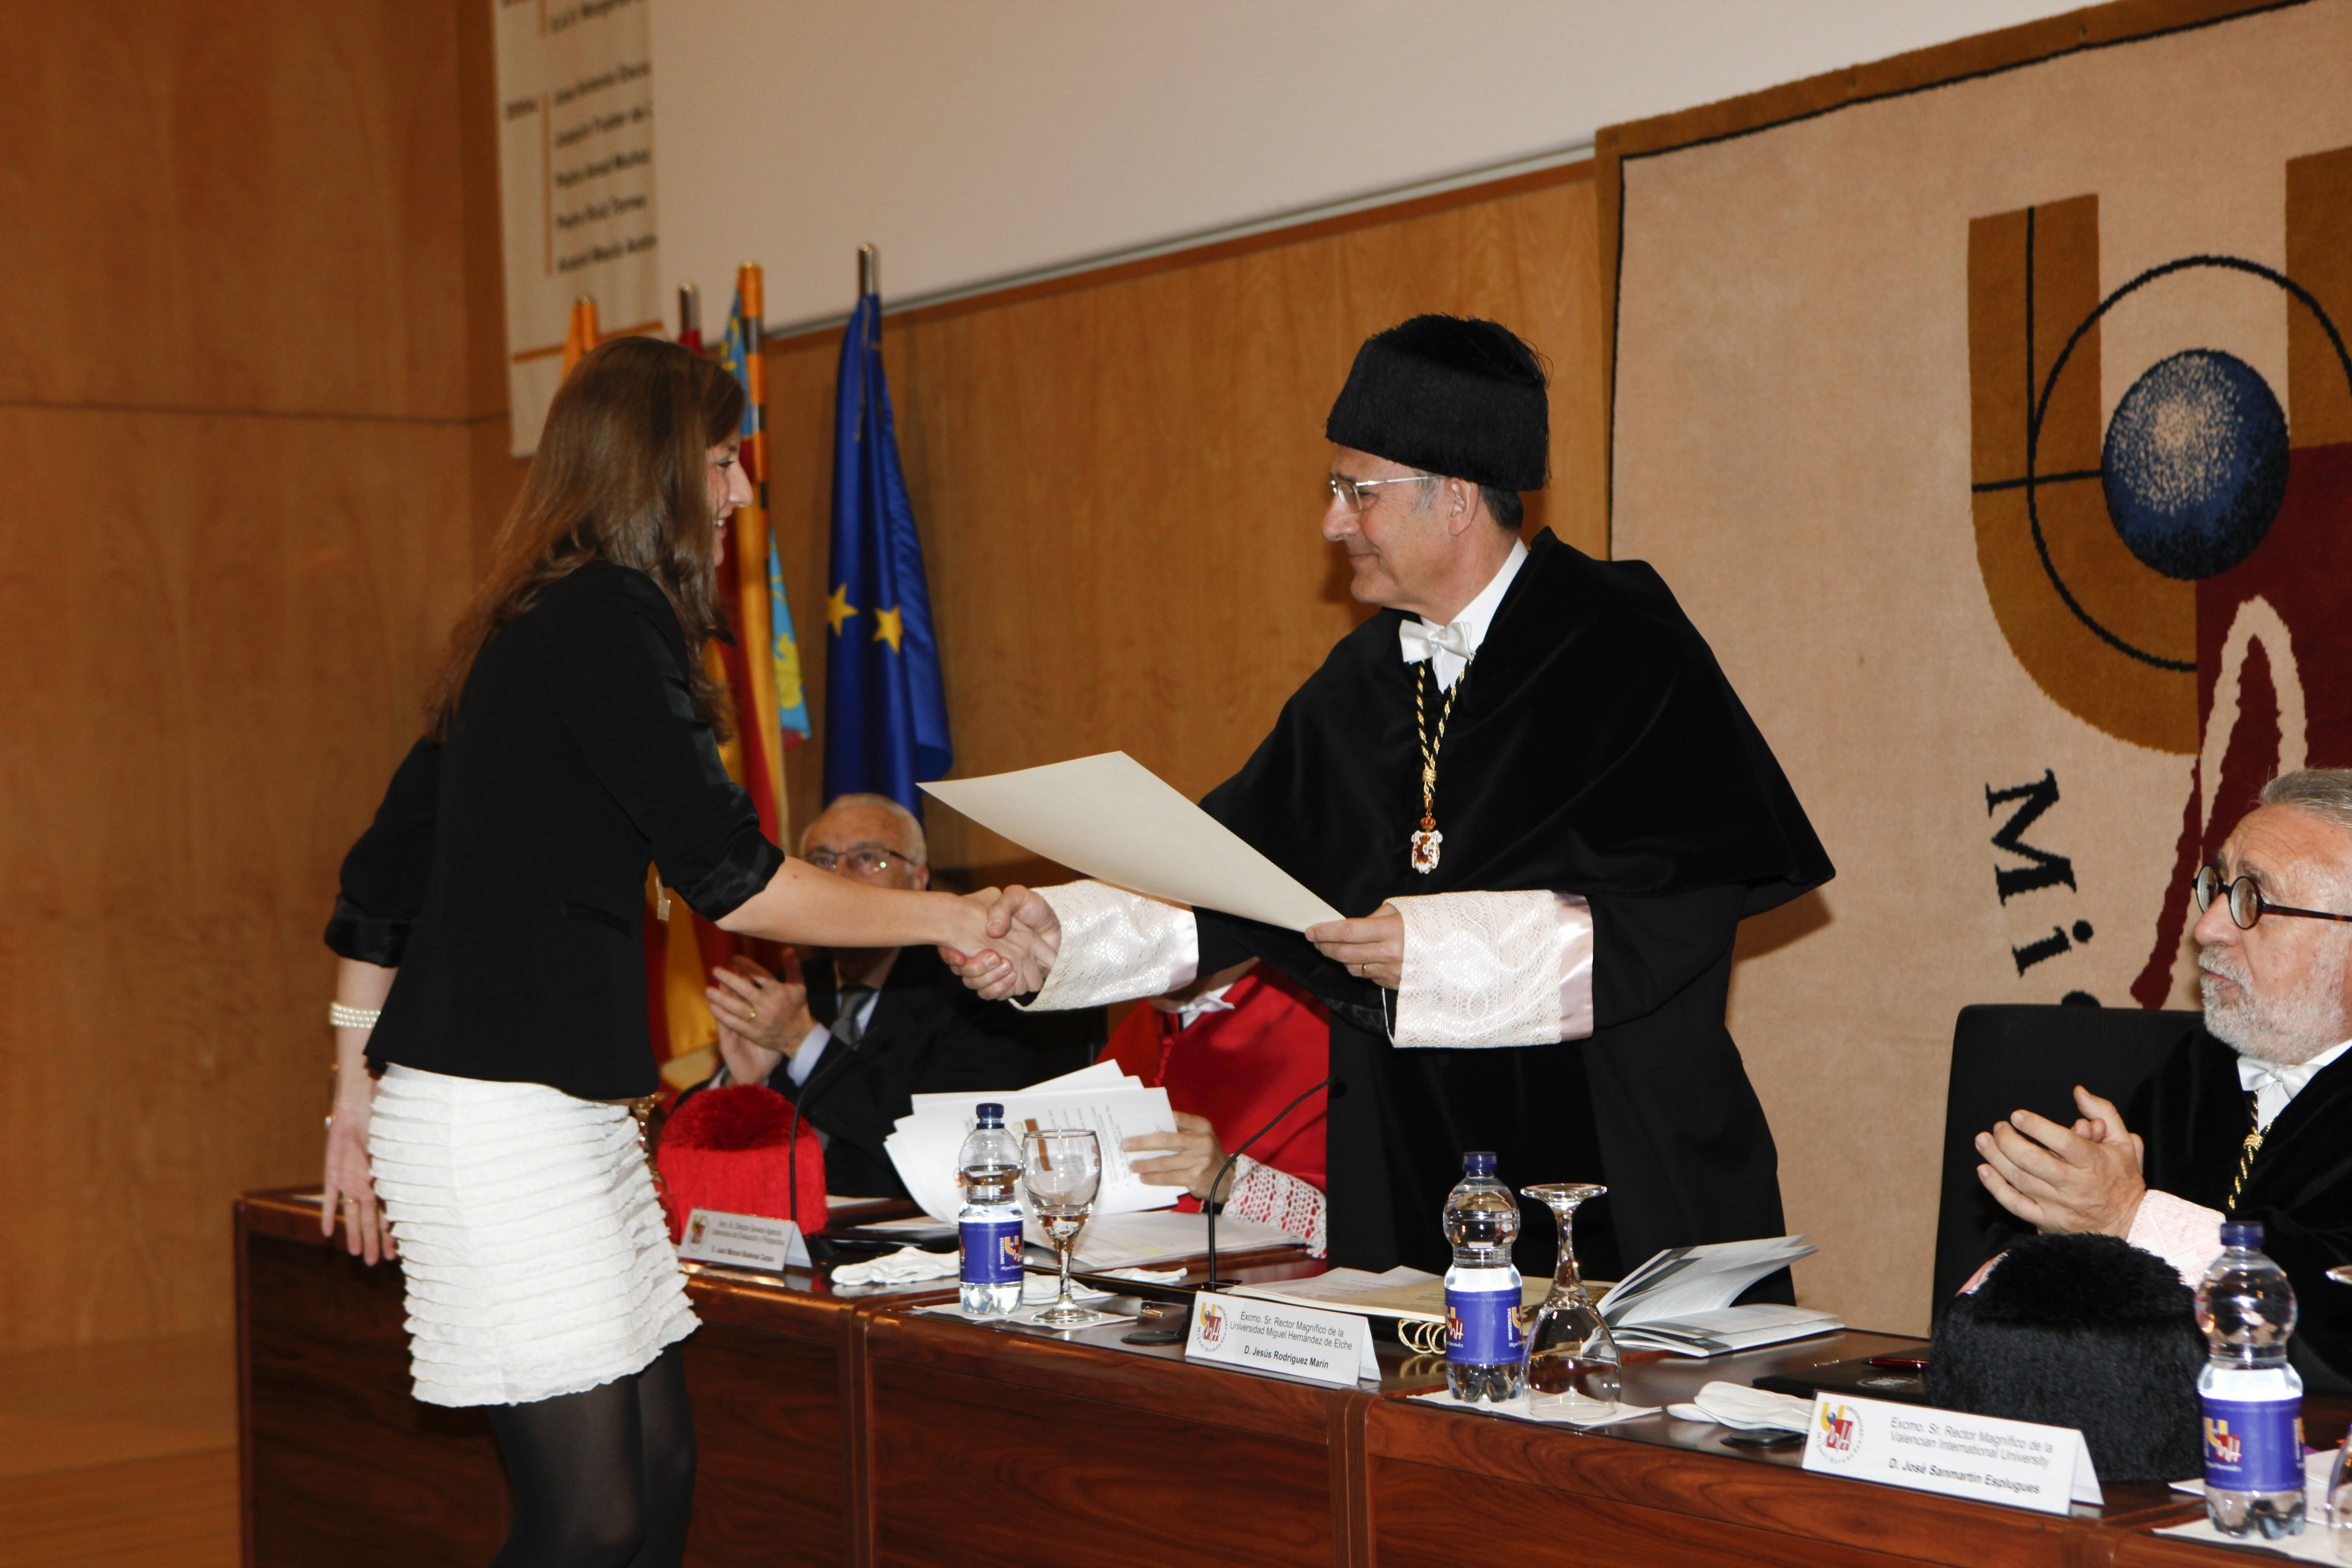 doctor-honoris-causa-luis-gamir_mg_0896.jpg